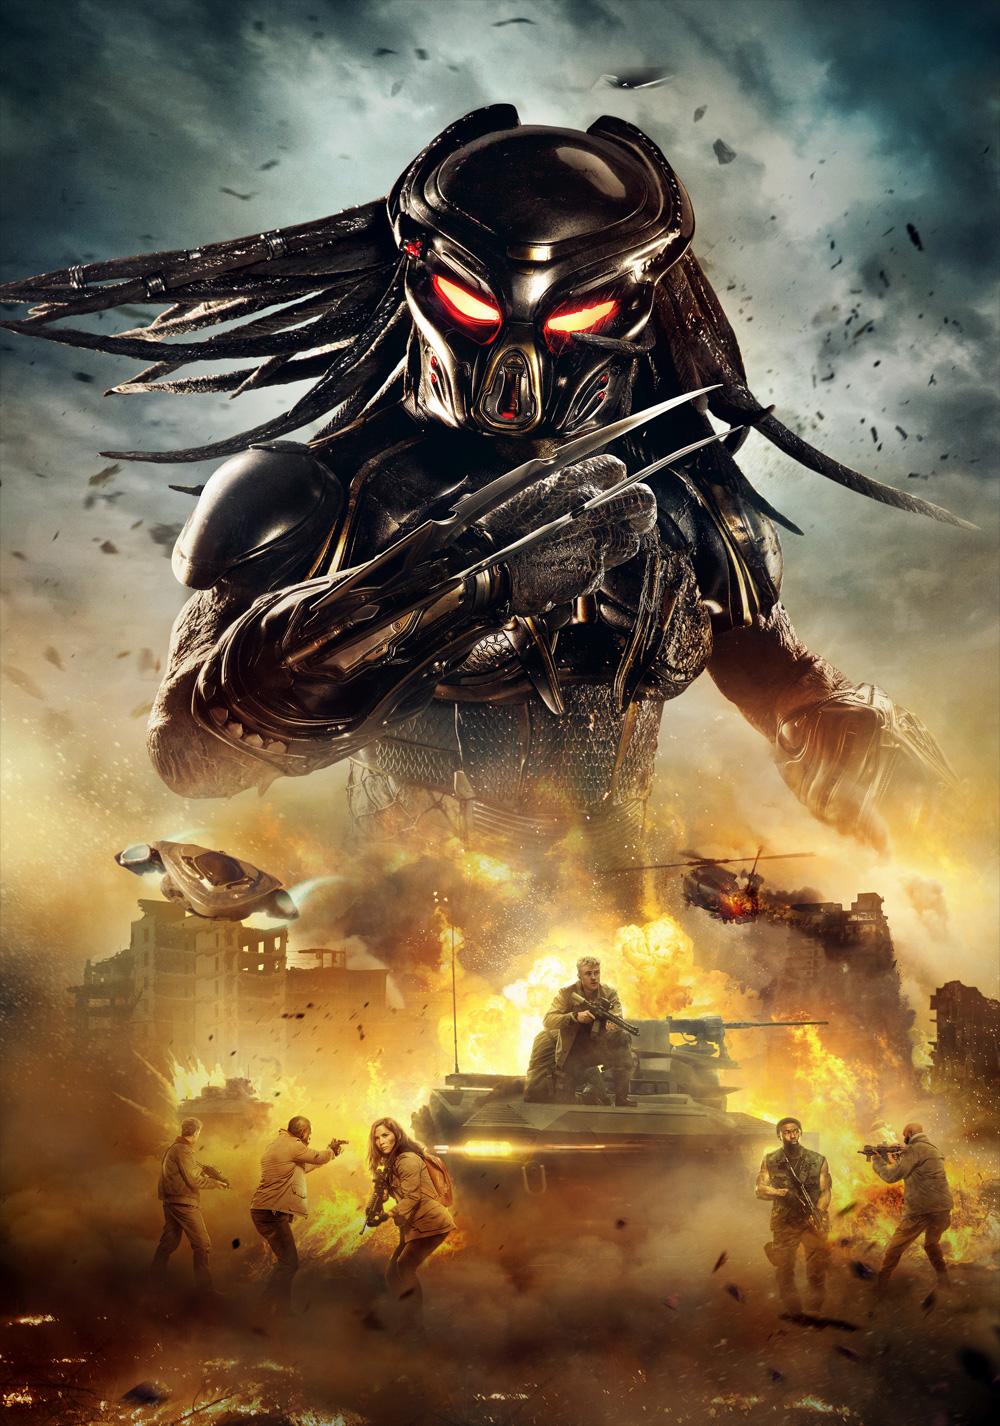 predator hindi audio fiction movies track science imdb film trailer poster database sci fi posters scientist